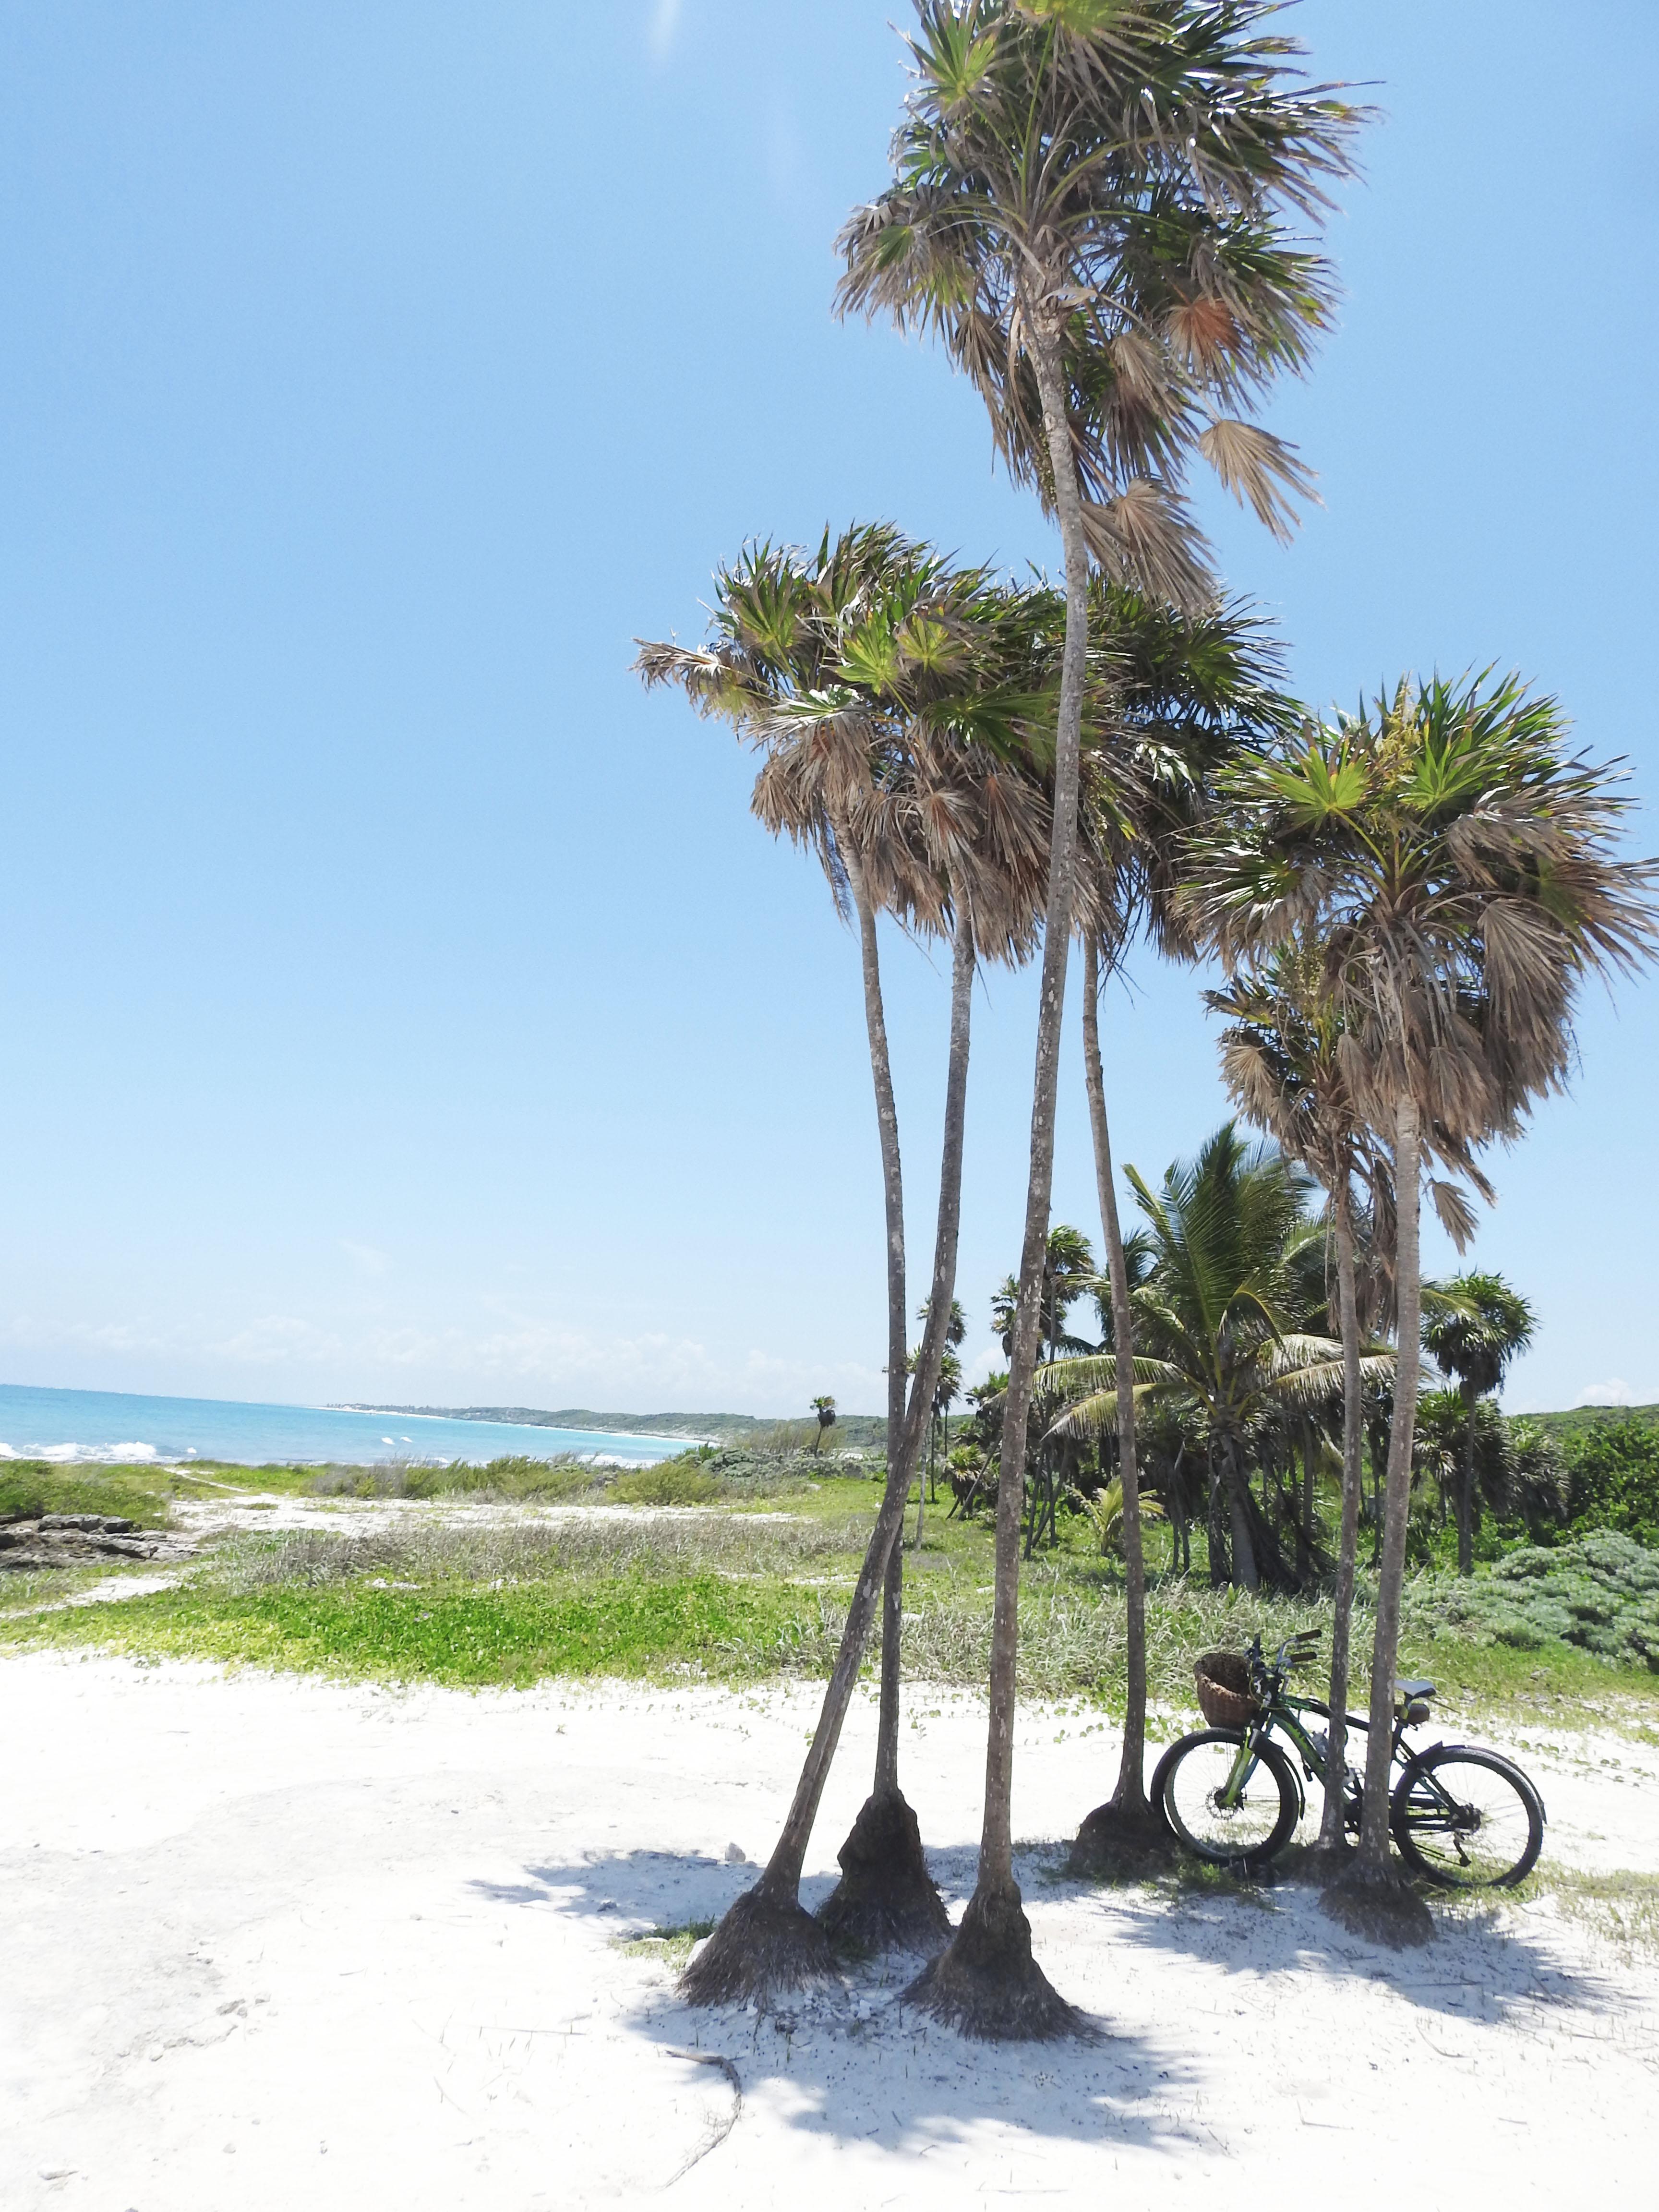 Beach cenote